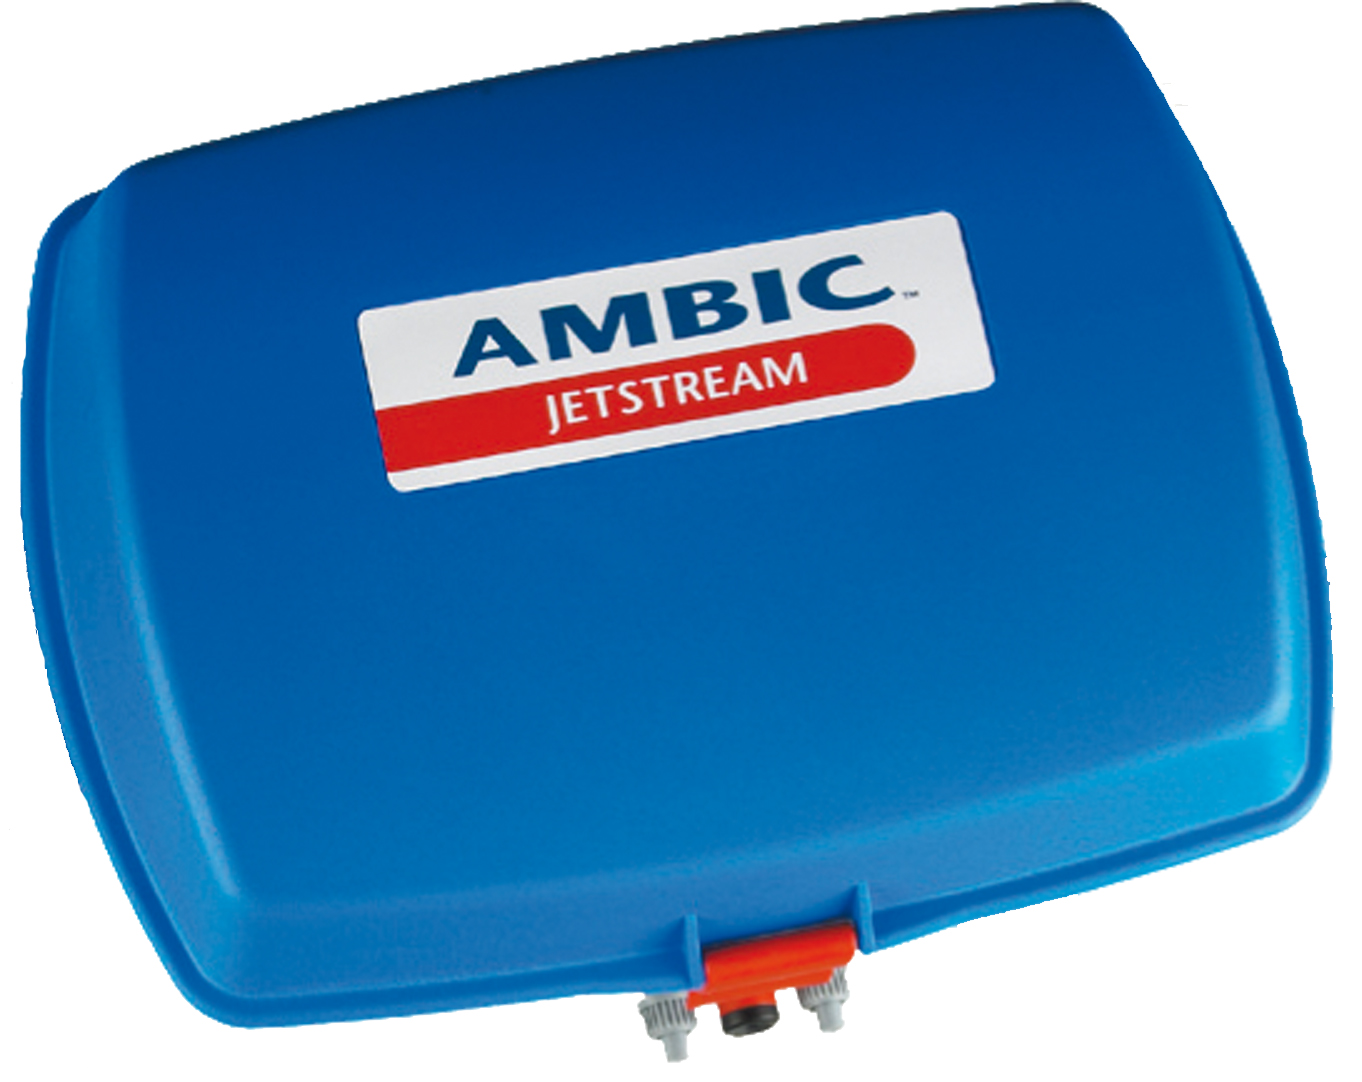 Image of Ambic Teat Spray Unit